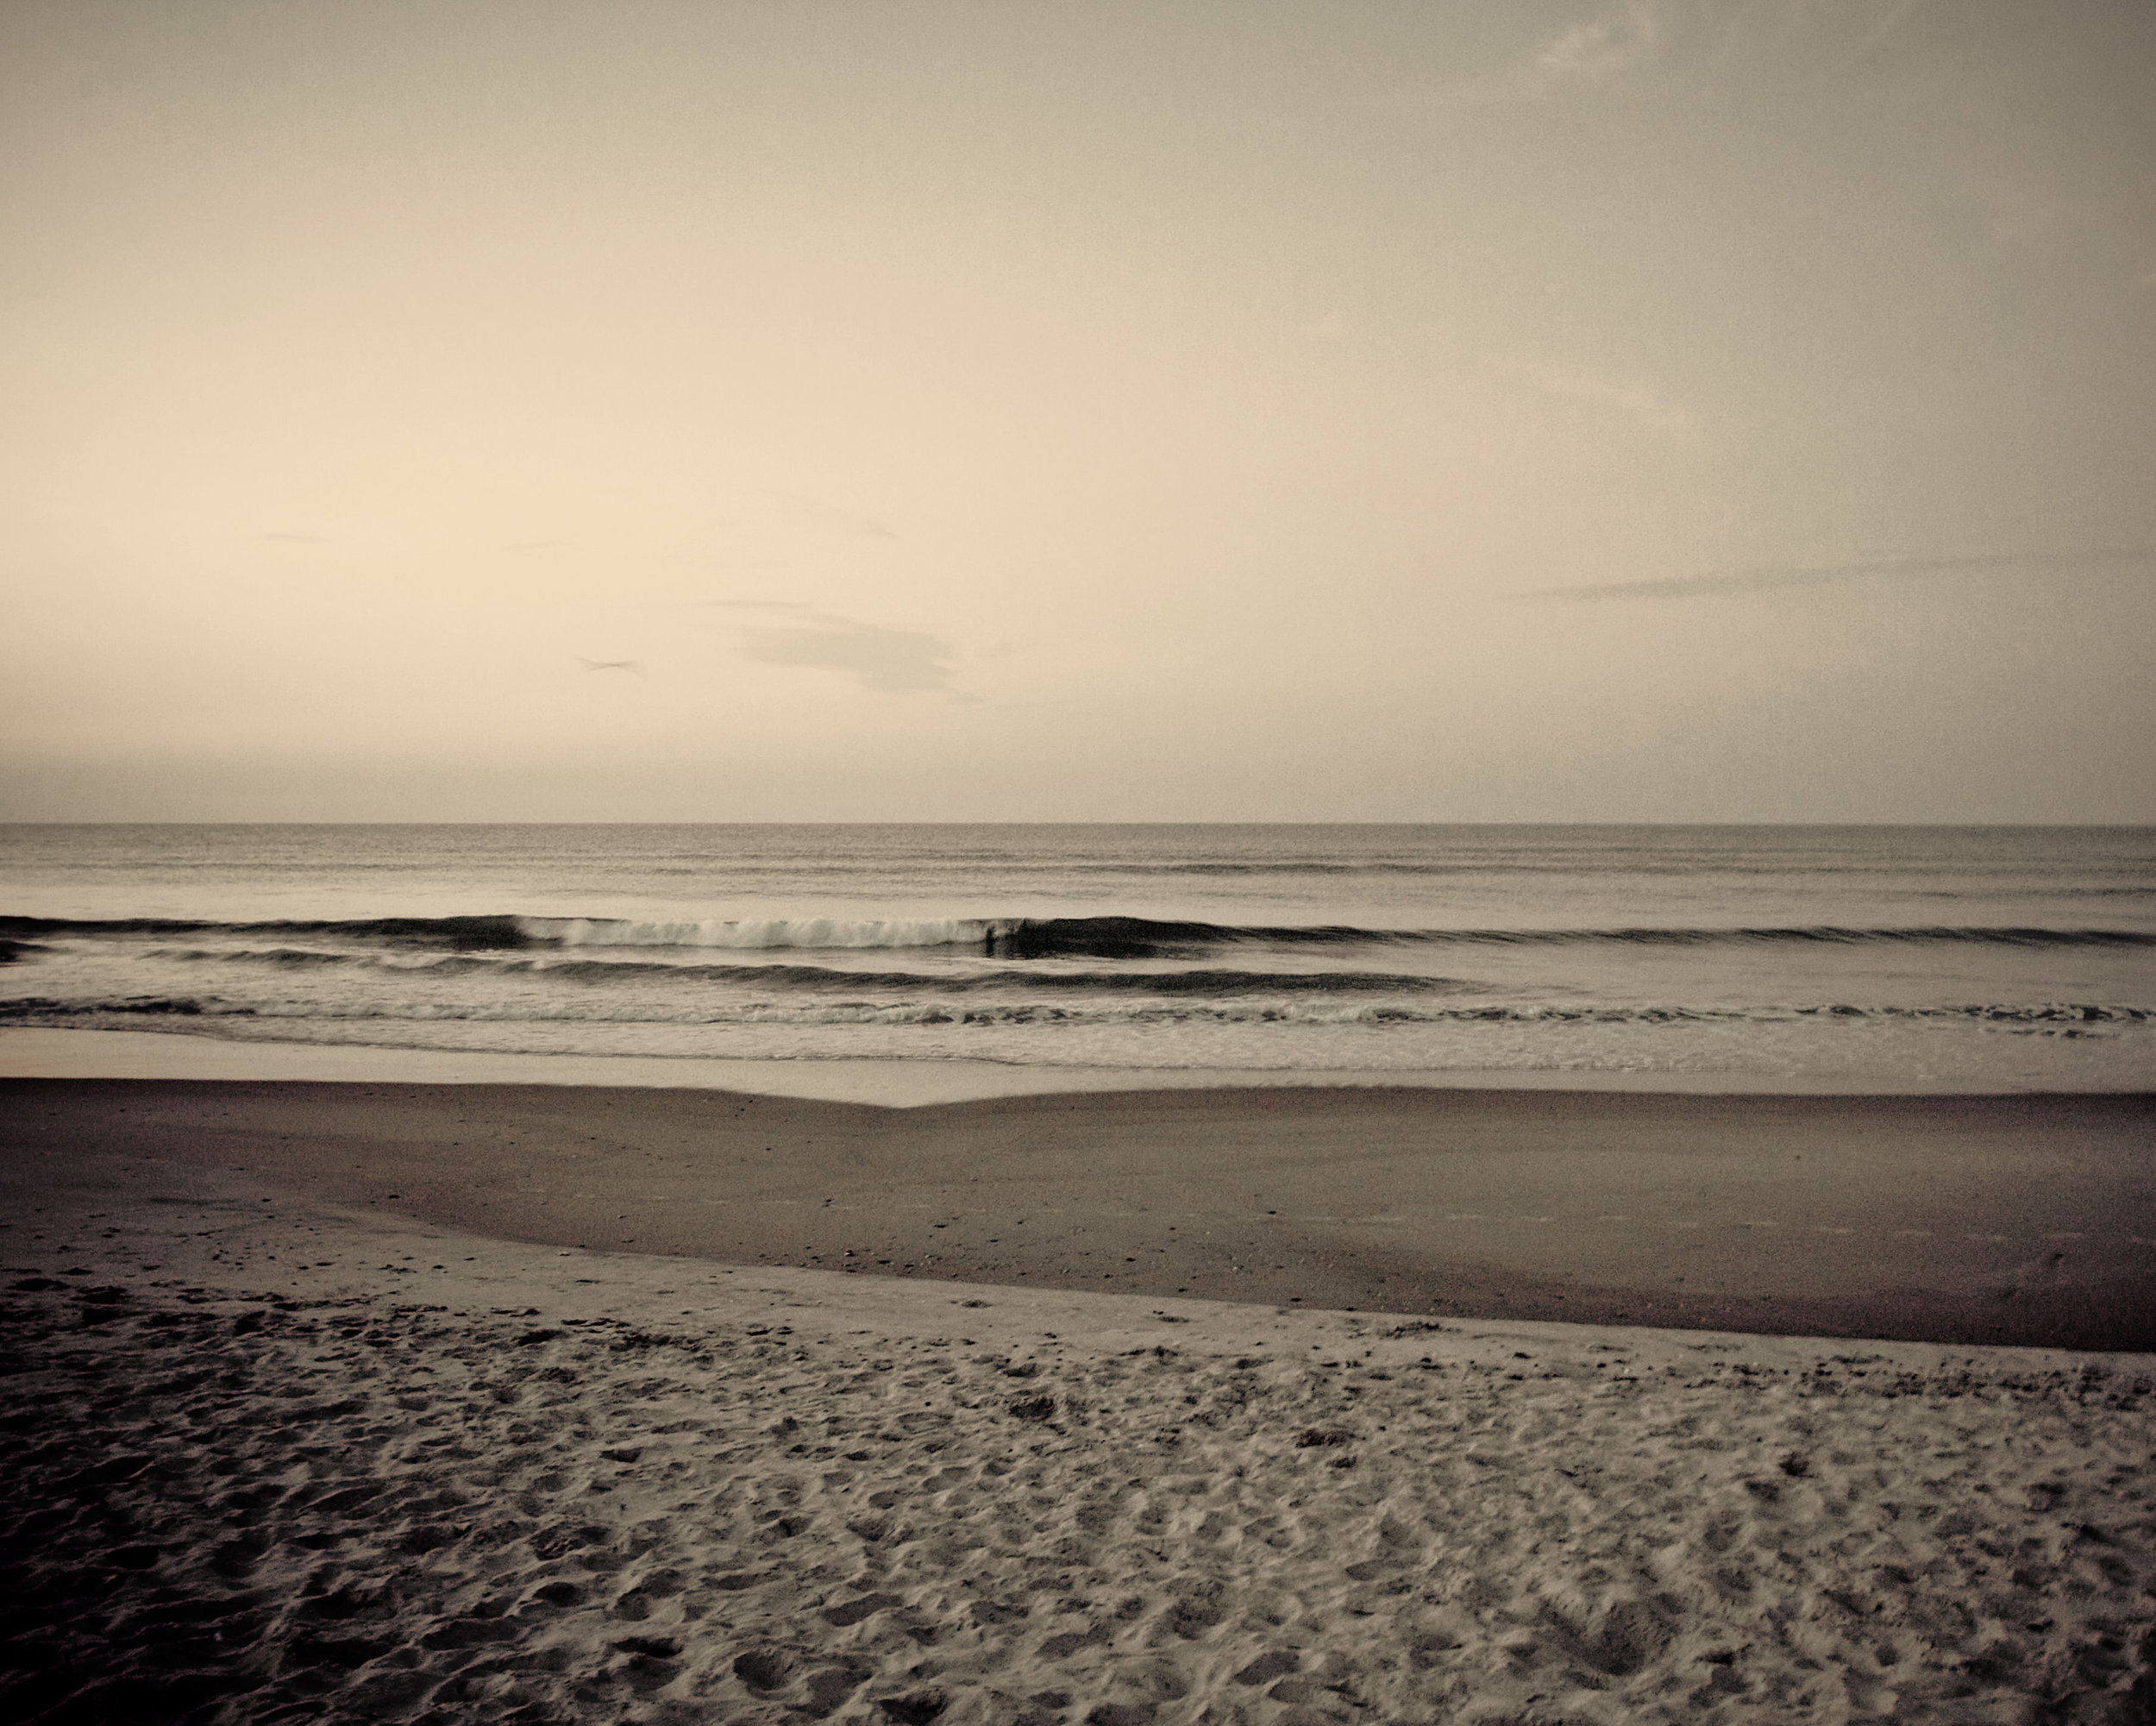 morning_on_the_atlantic-ocean-7000-smugmug.jpg